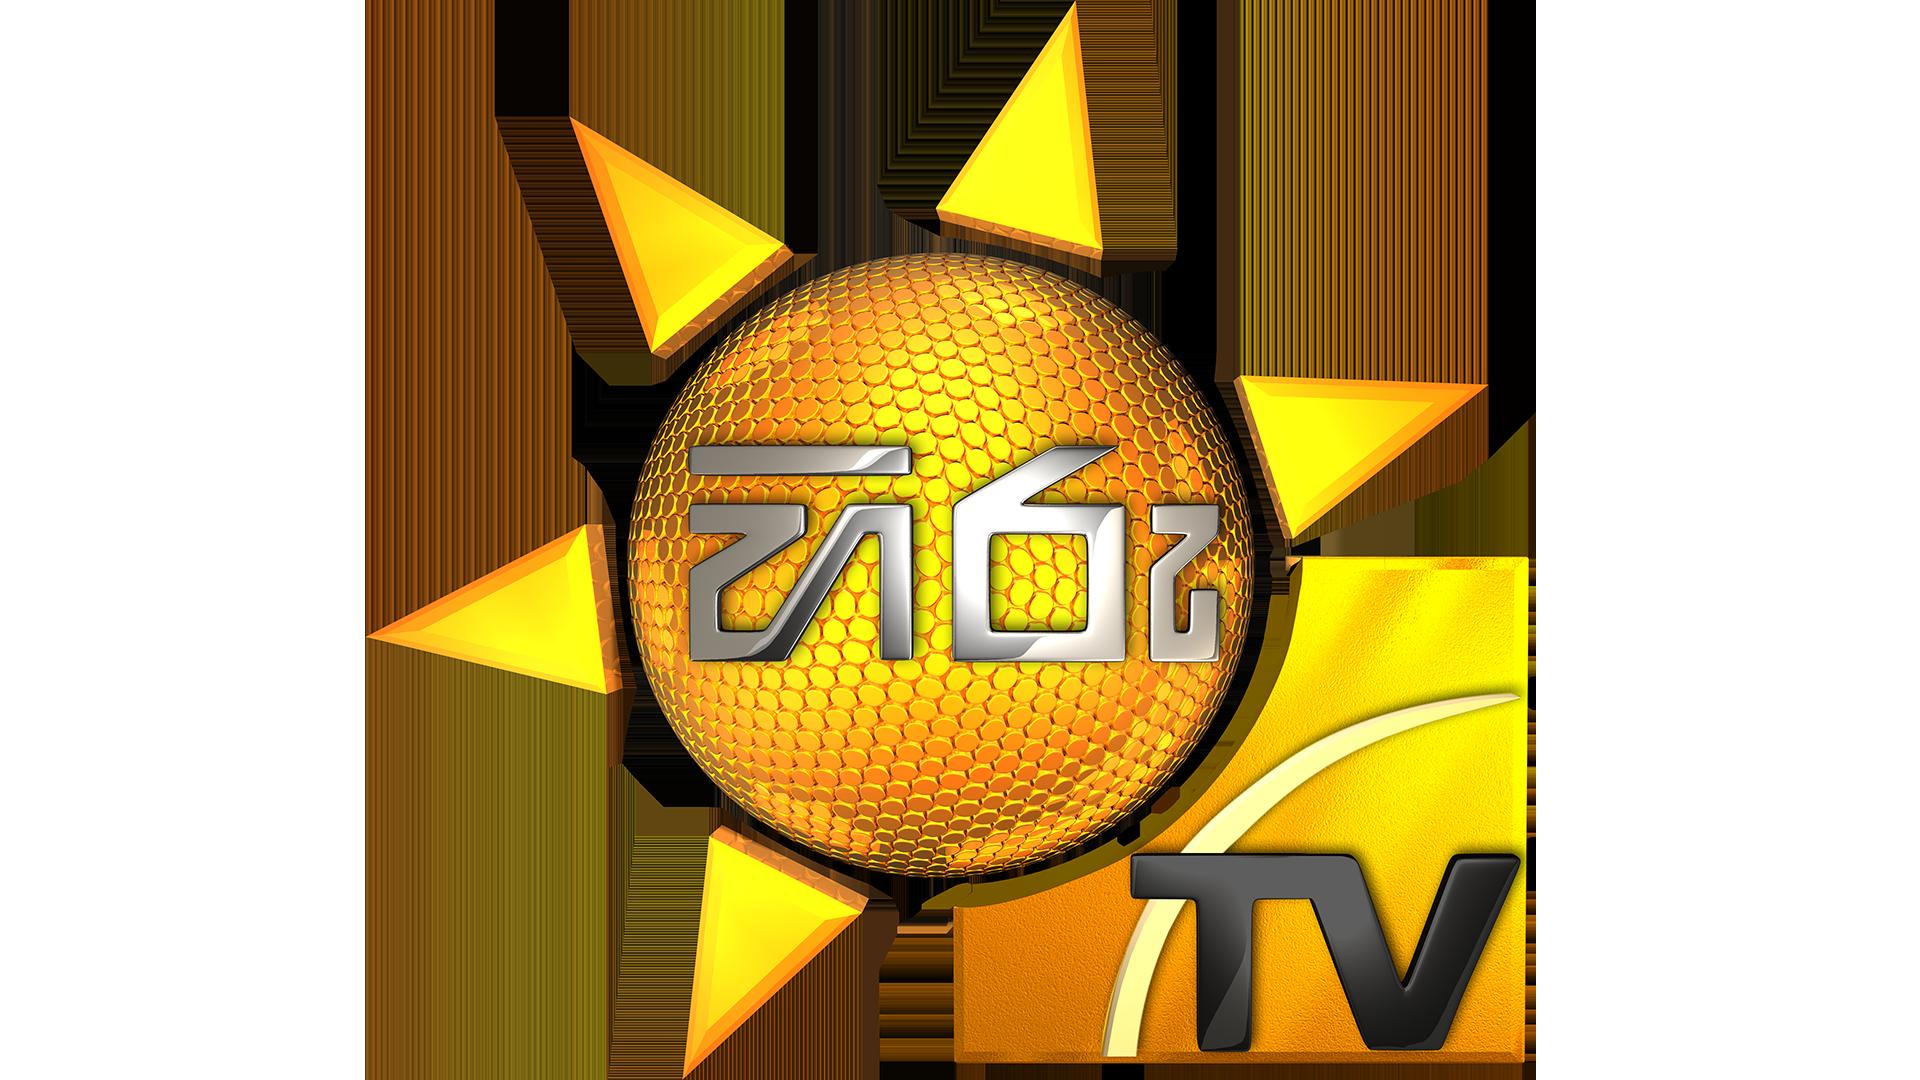 Hiru TV Official Web Site|Sri Lanka Live TV|Sri Lanka TV Channel